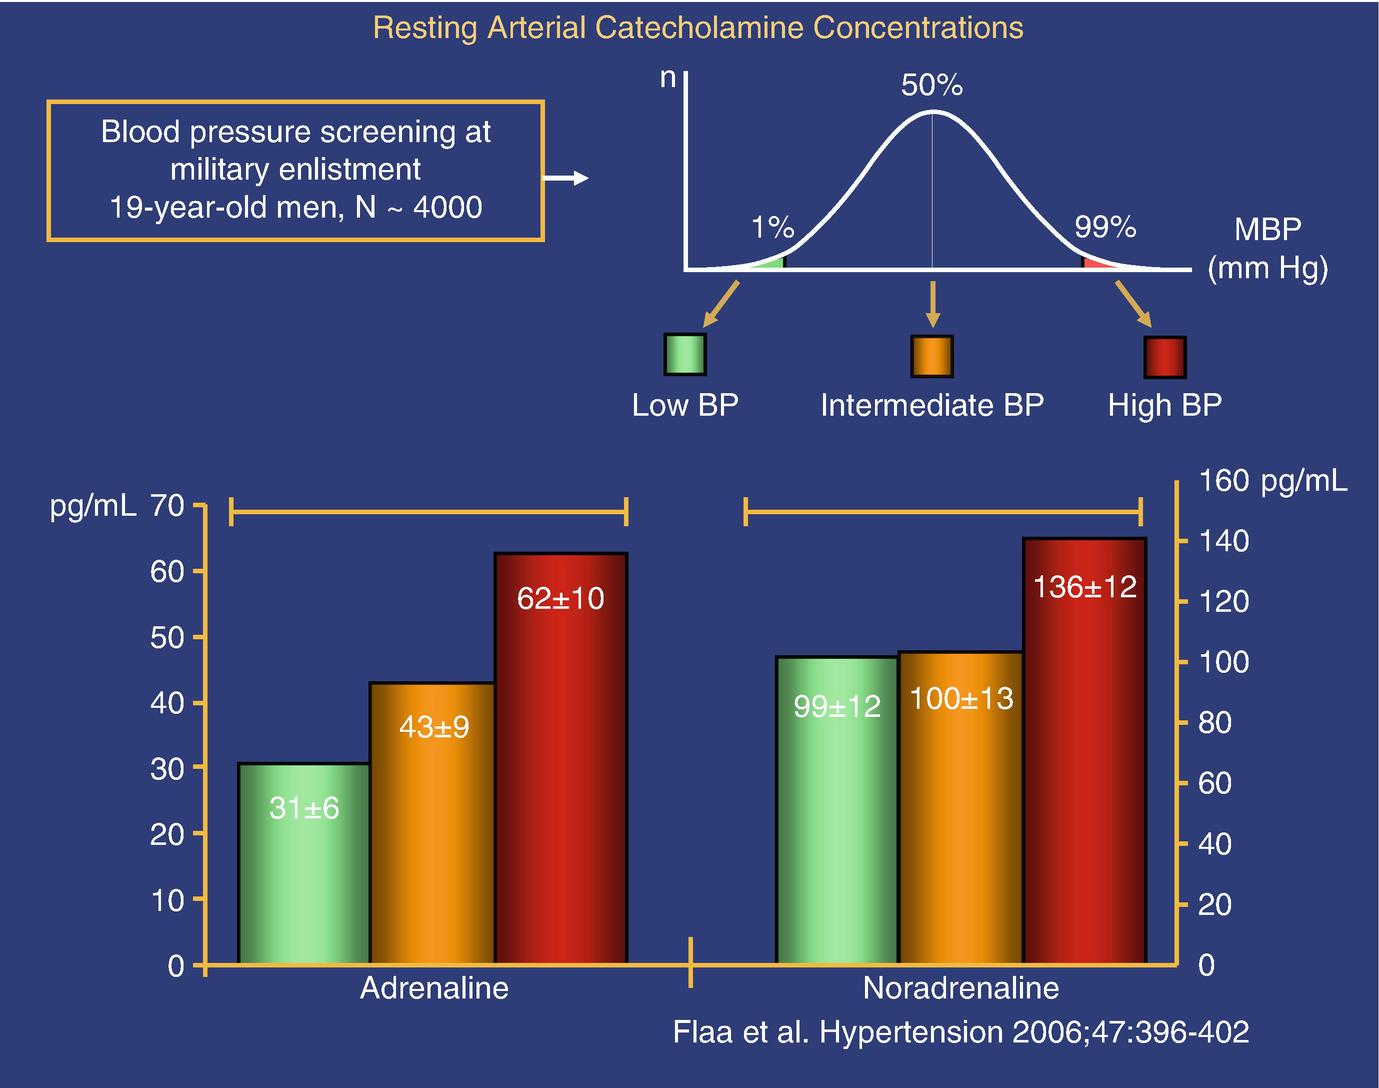 Sympathoadrenal Reactivity to Stress as a Predictor of